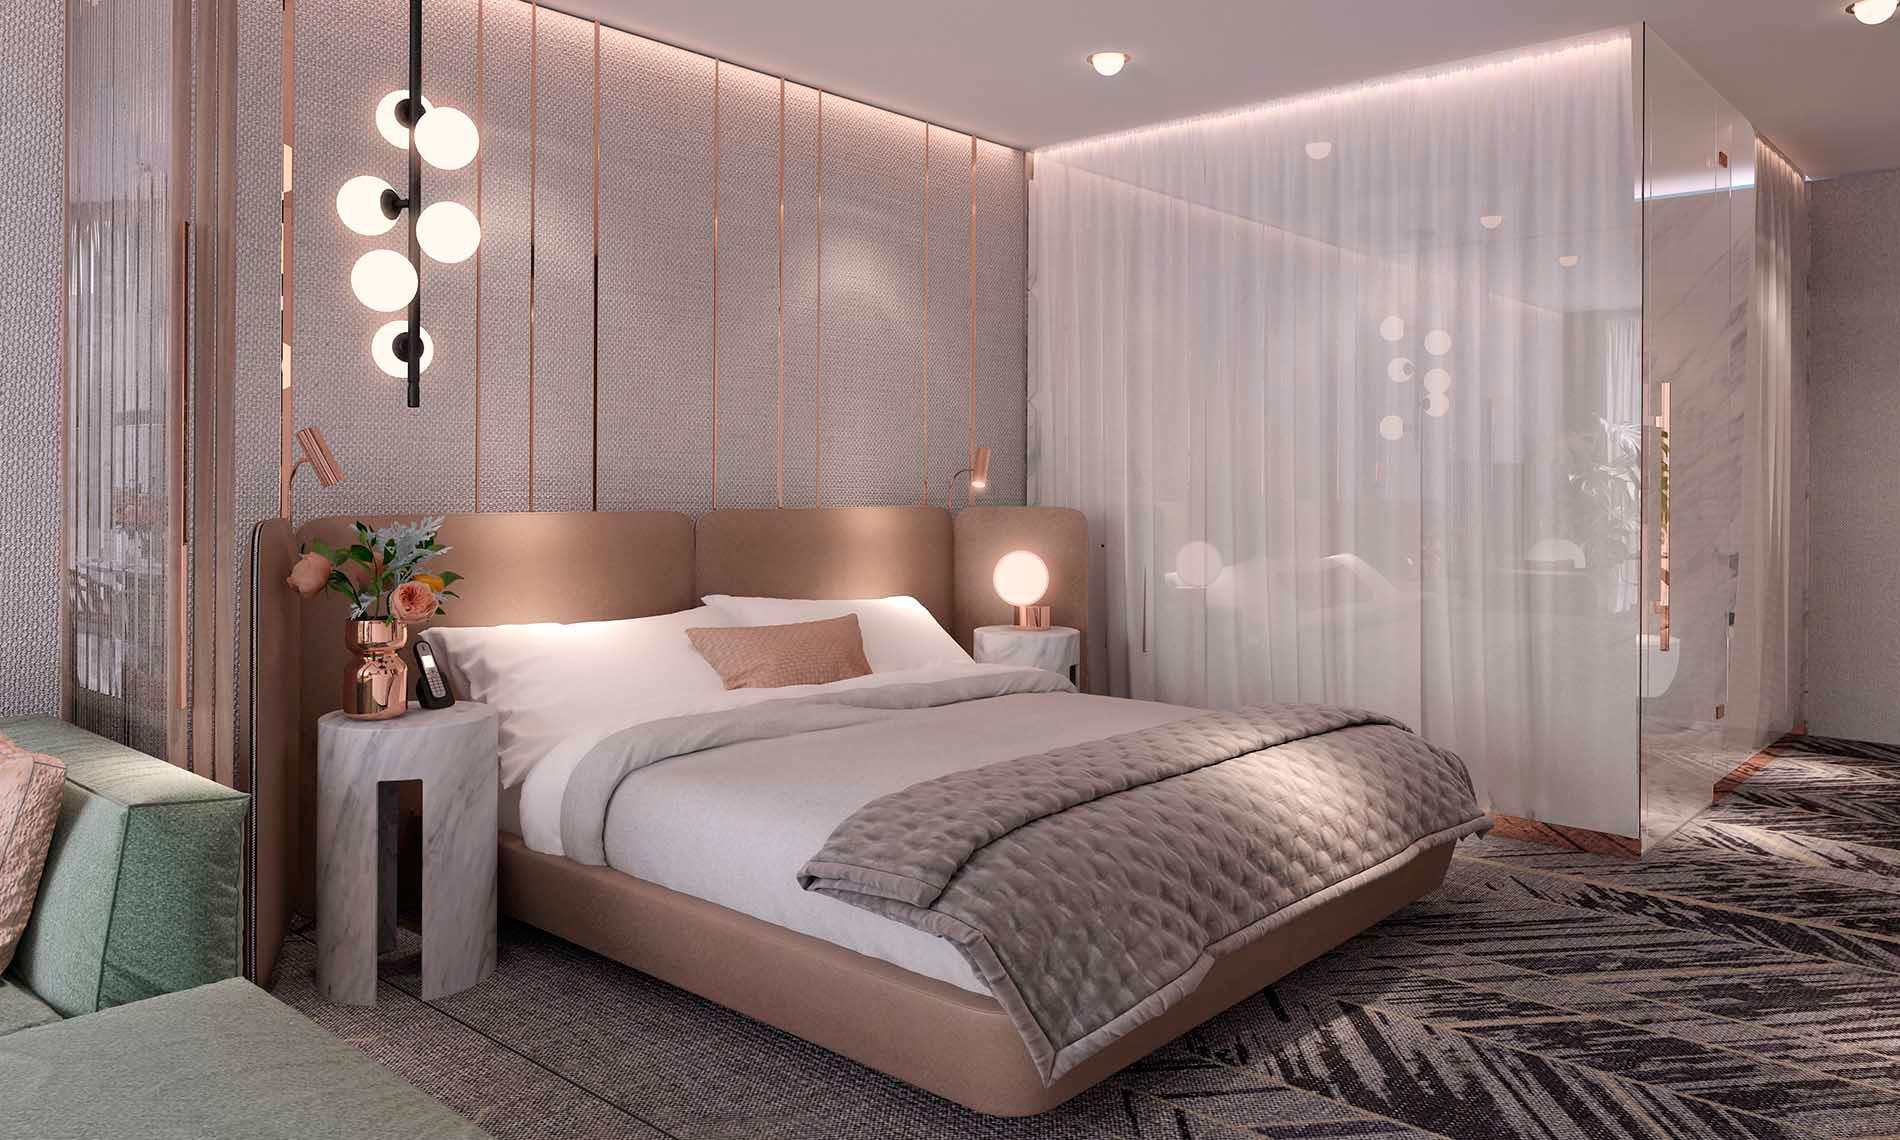 slaapkamer-ontwerp-met-koper-en-marmer-2